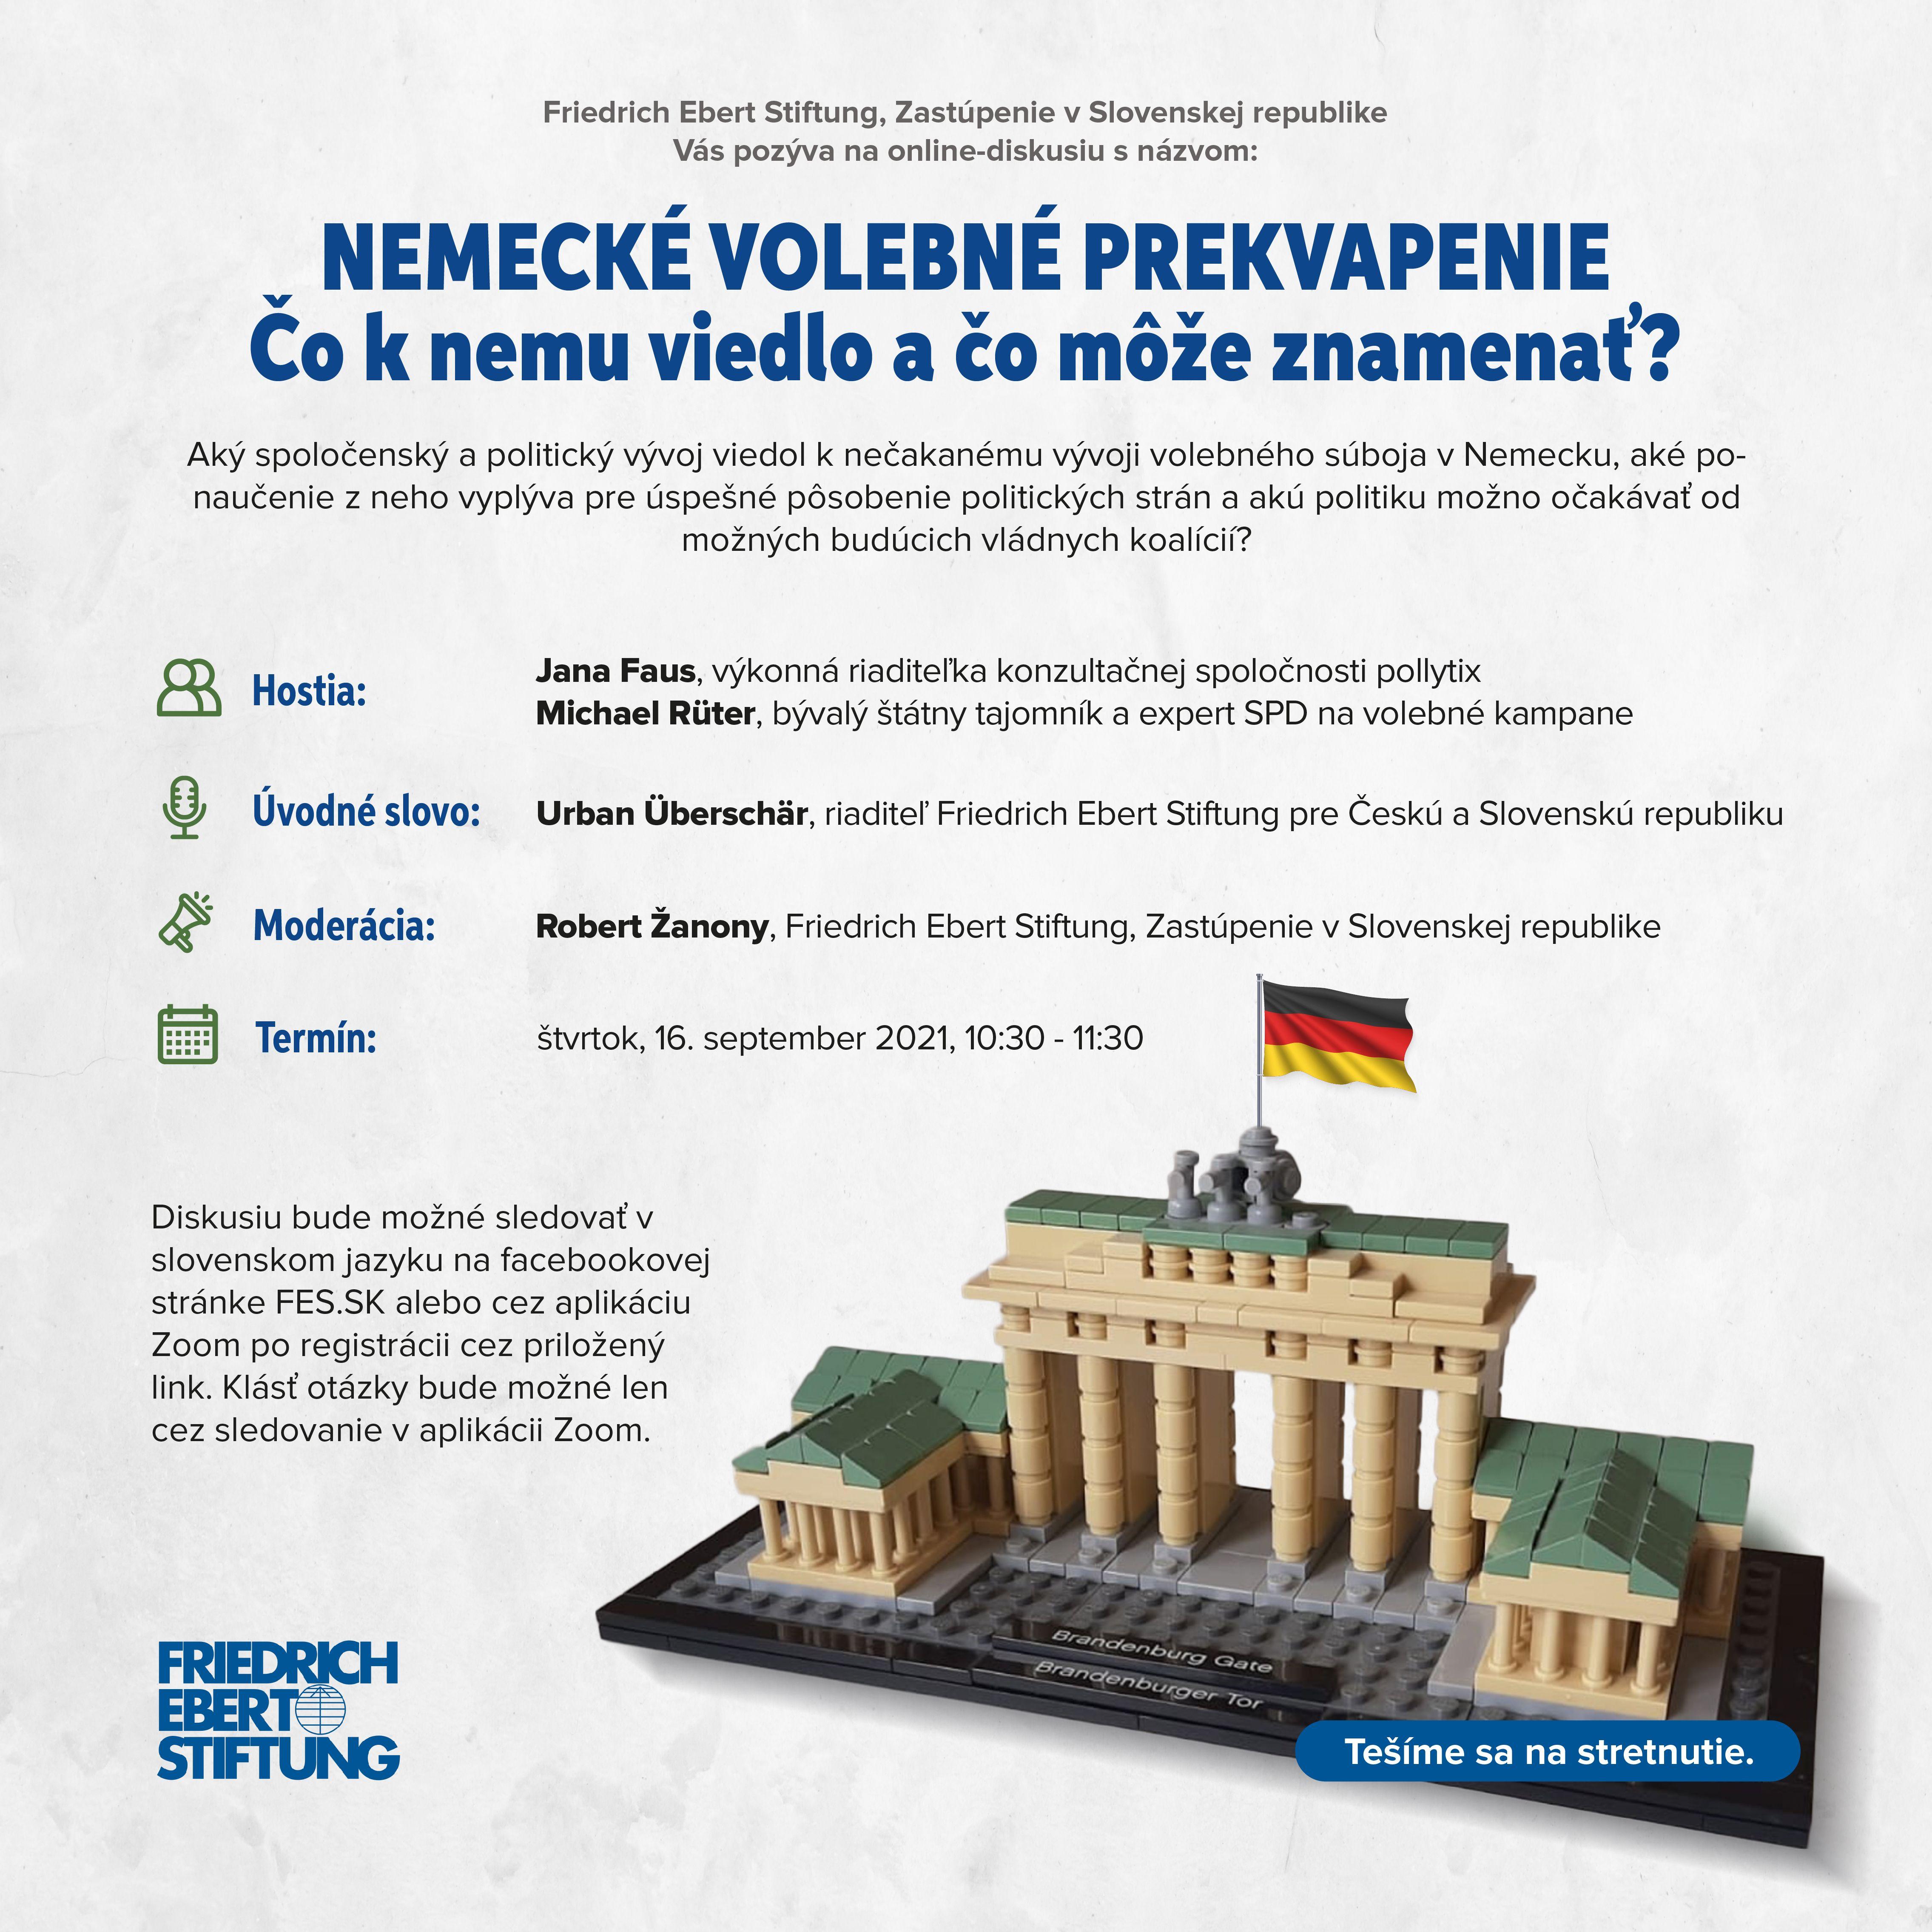 nemecke_volebne_prekvapenie.jpg